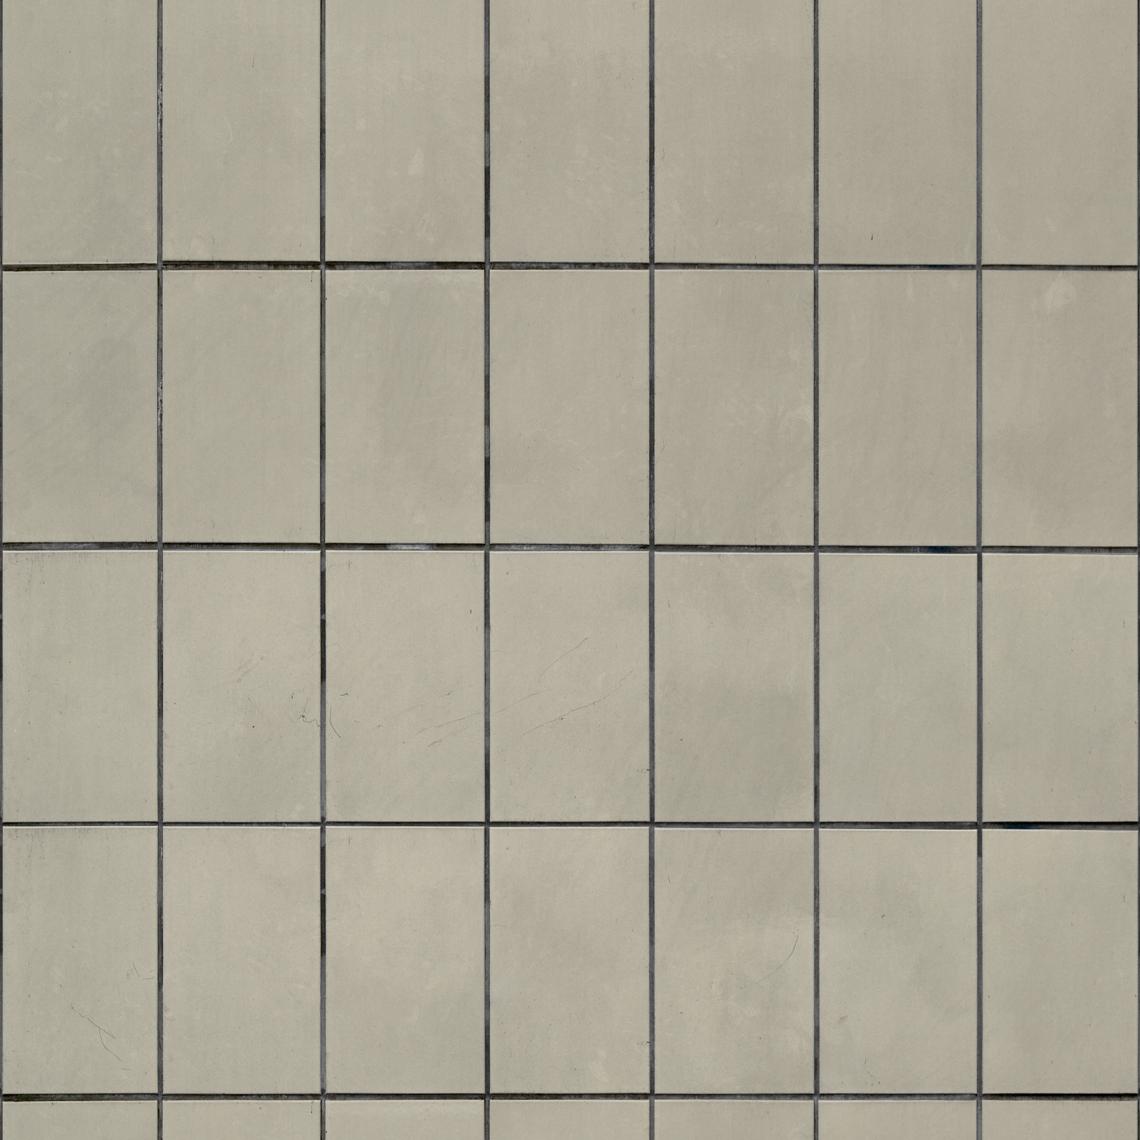 Simple-Tiles-05-Albedo